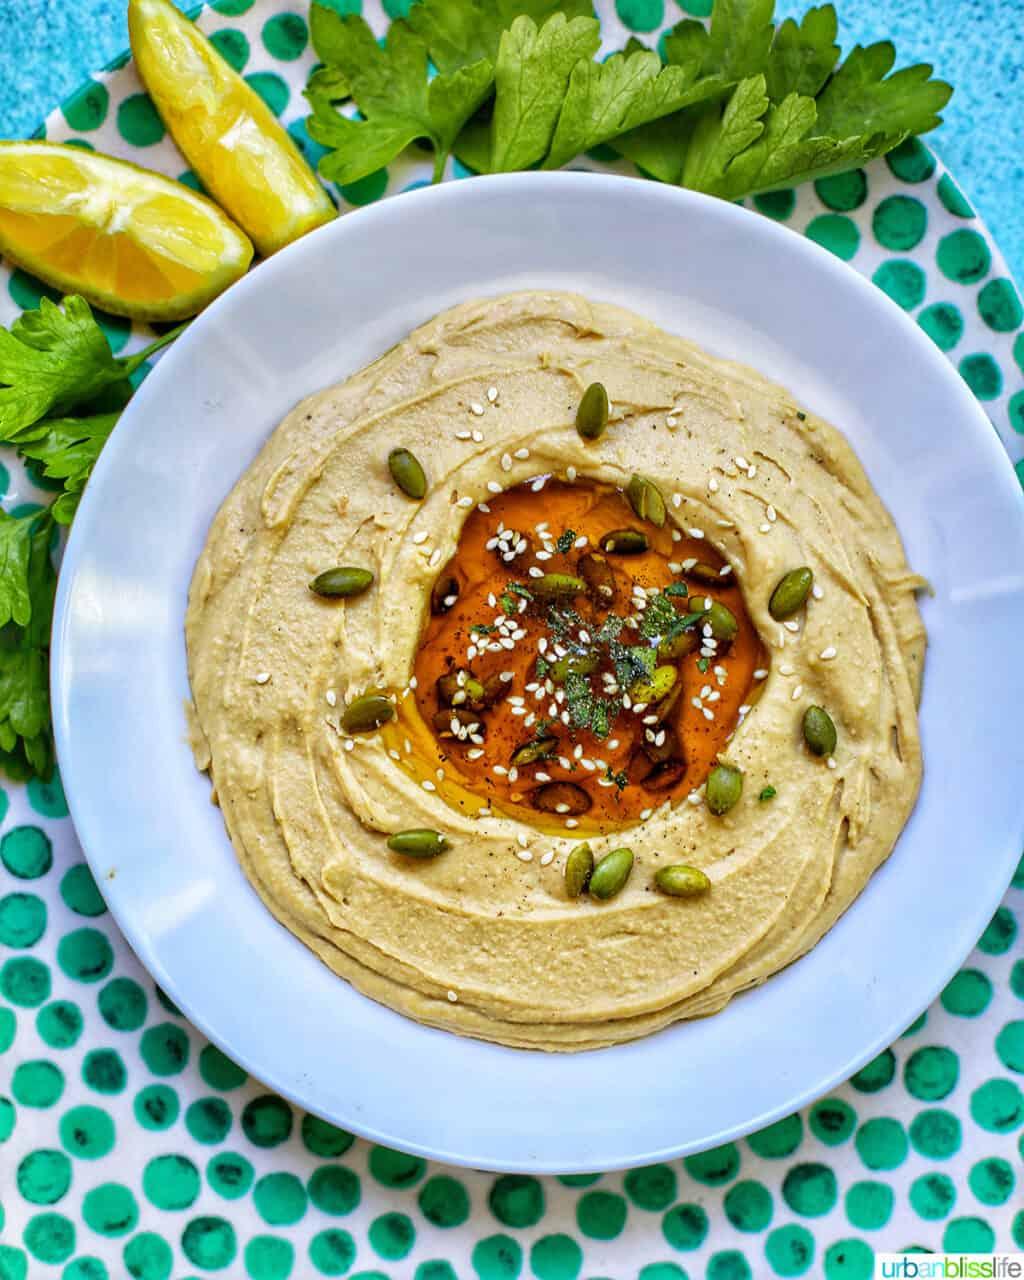 hummus in a white bowl on green polka dot platter with lemon slices